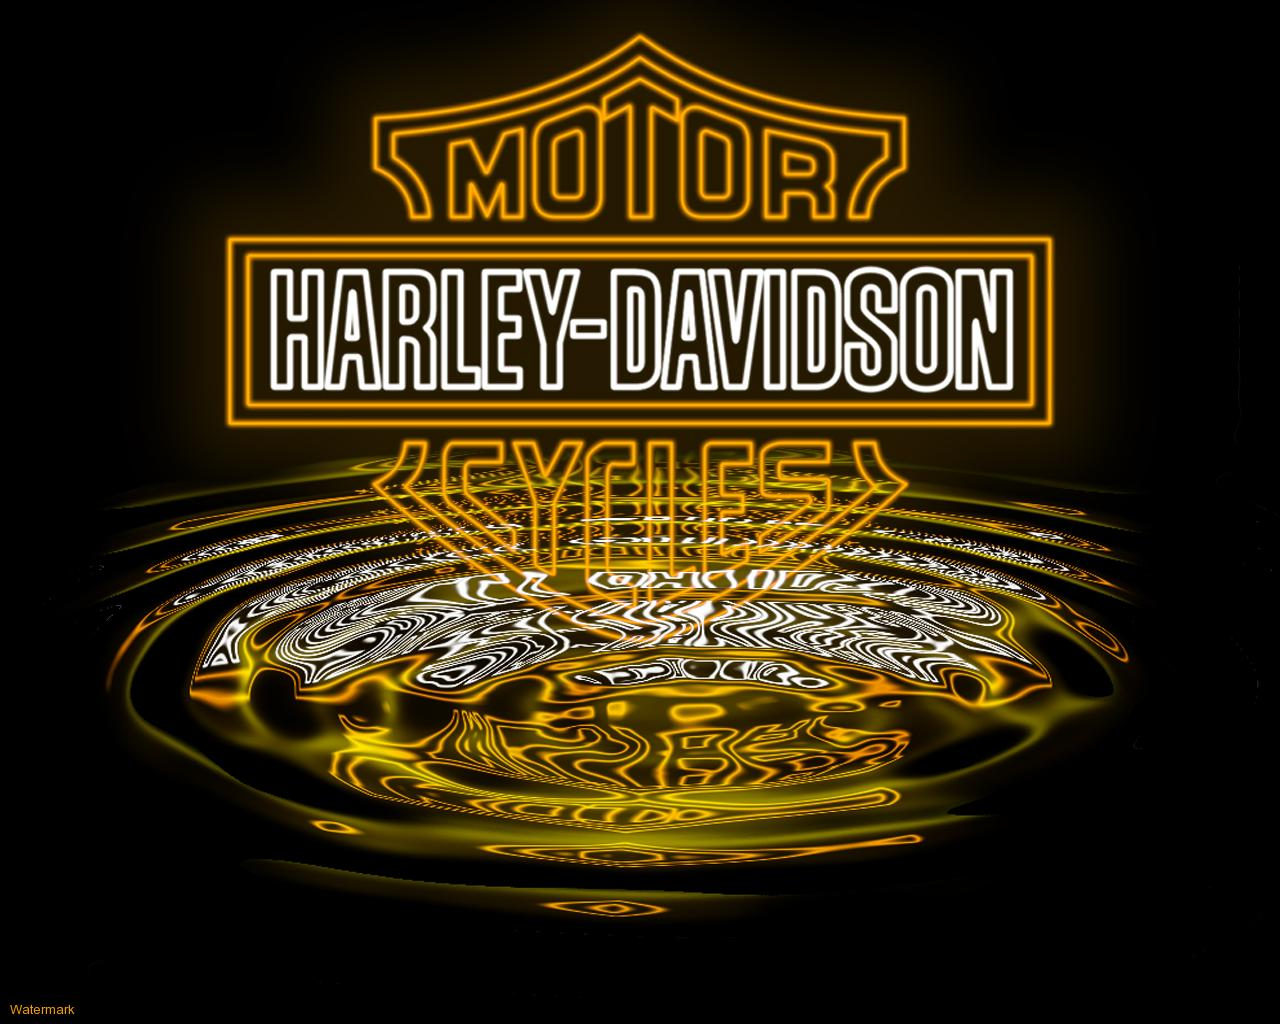 Harley Davidson Logo Wallpaper: Harley Davidson Phone Wallpaper